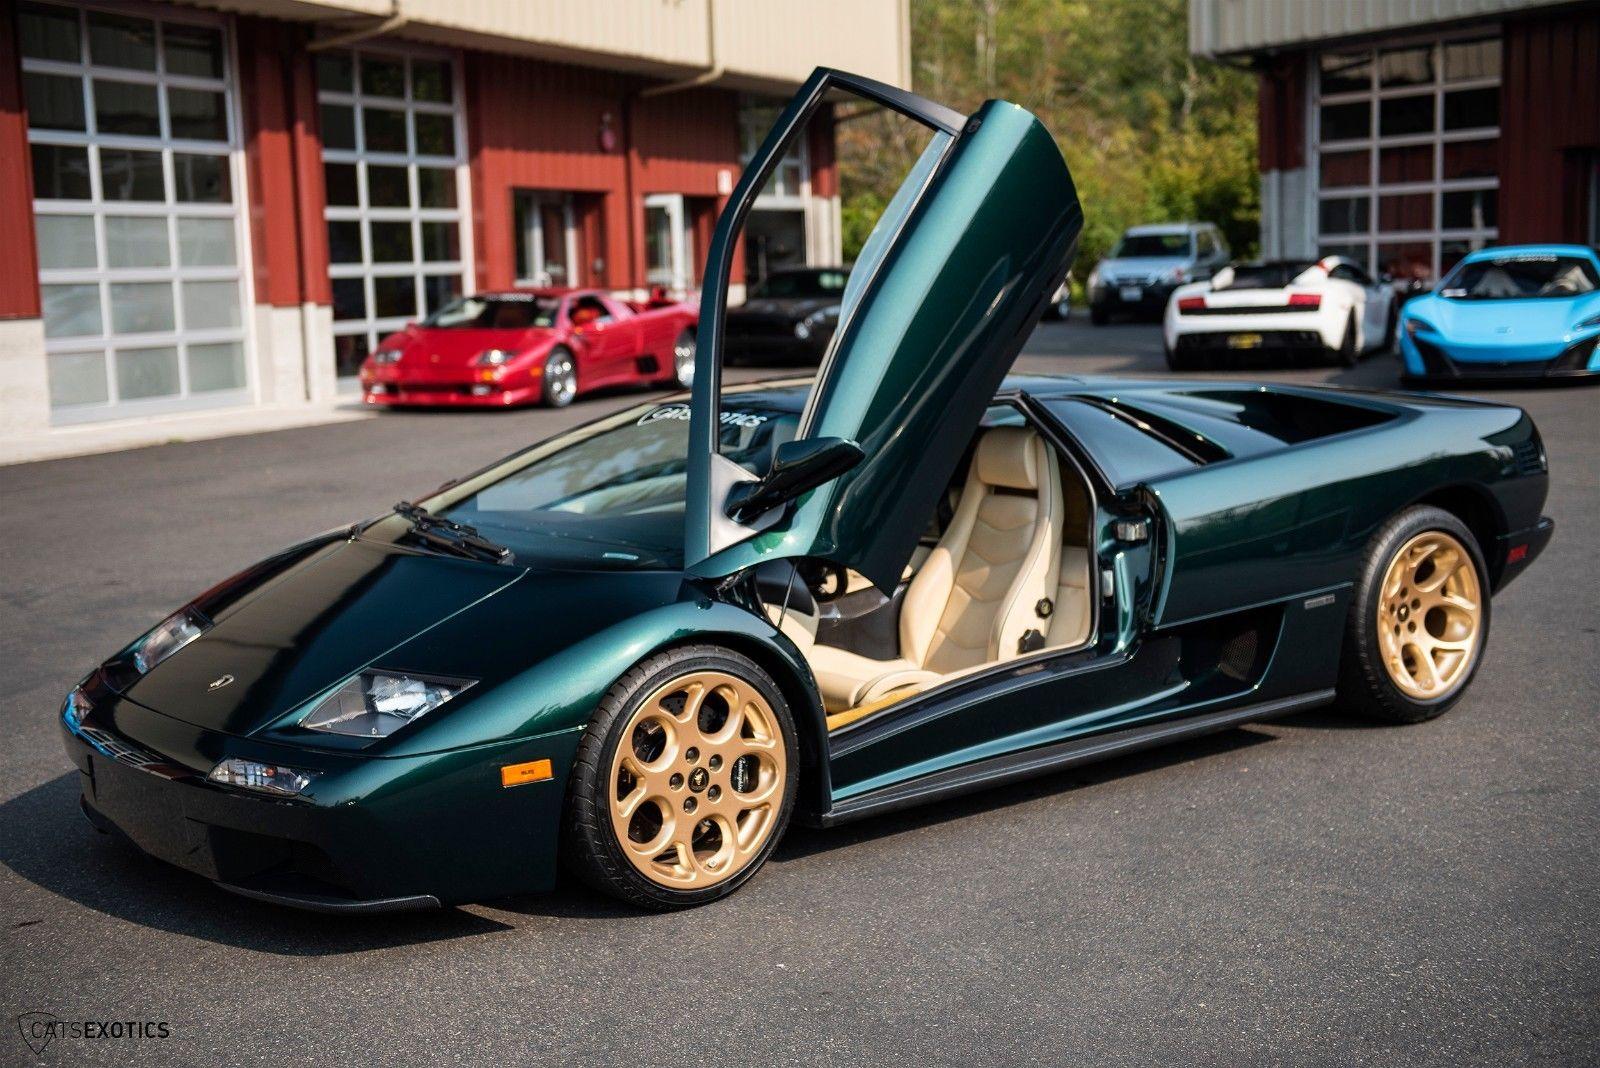 Great 2001 Lamborghini Diablo 6 0 Vt 2 Owner Car Driven Exotics Exhaust Clear Bra Service Just Performed 2017 2018